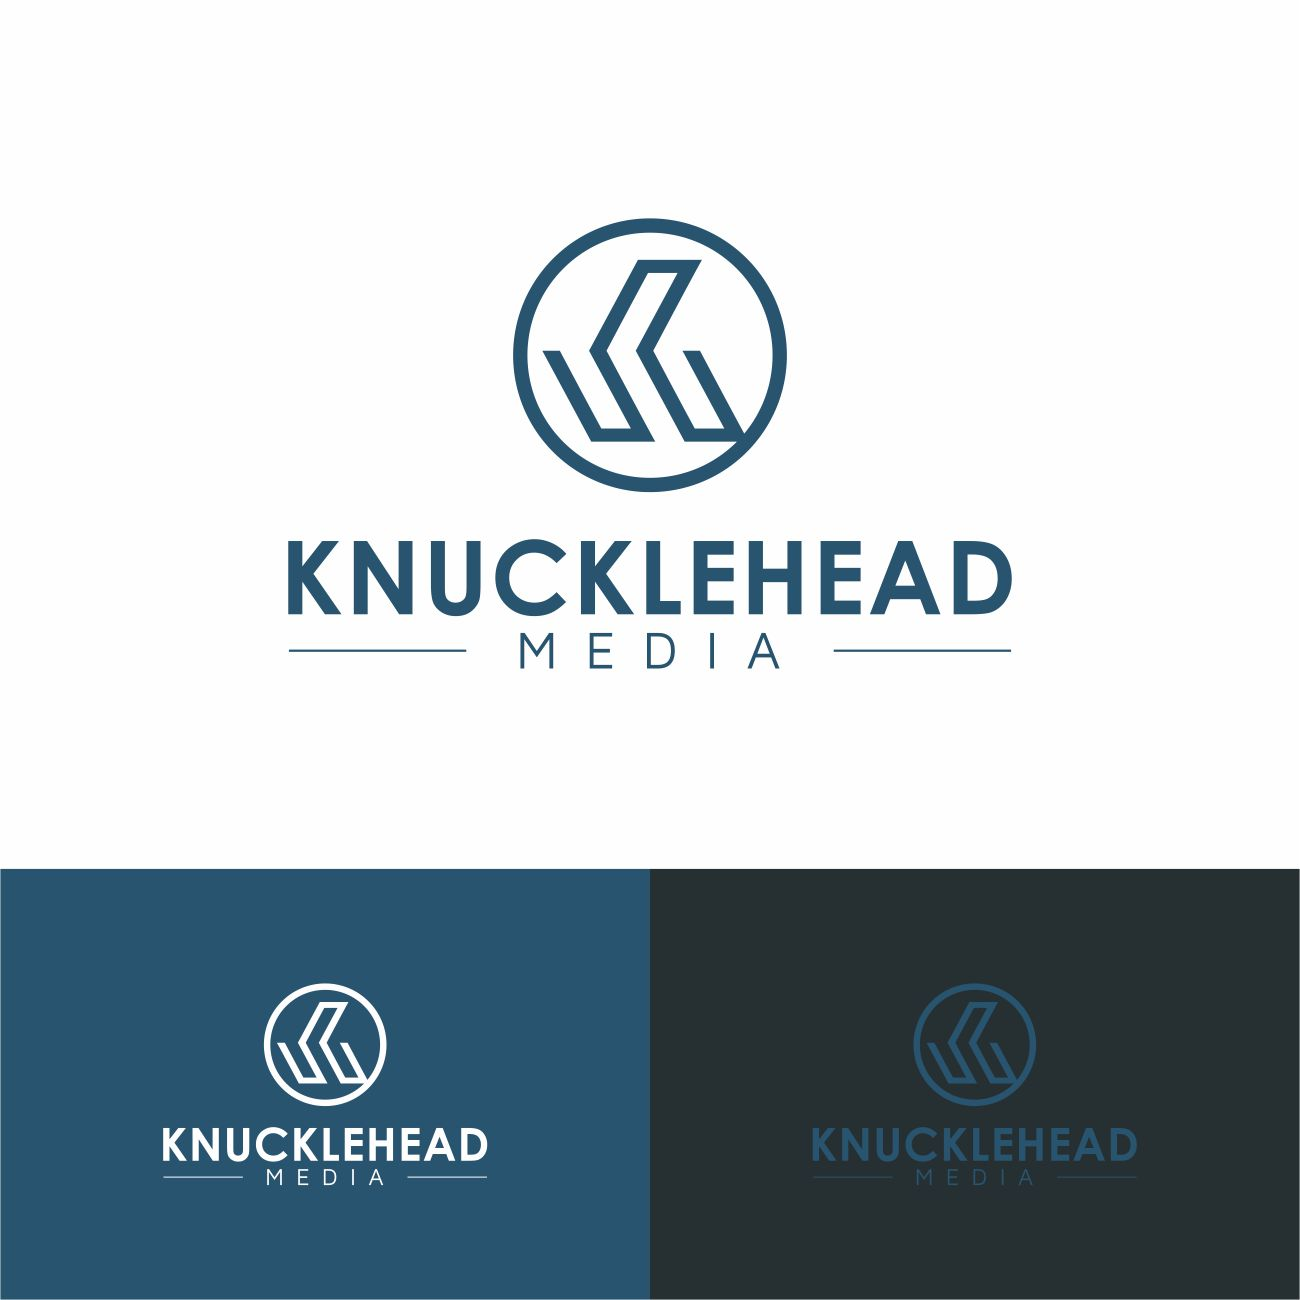 Logo Design by RasYa Muhammad Athaya - Entry No. 98 in the Logo Design Contest Imaginative Logo Design for knucklehead media.